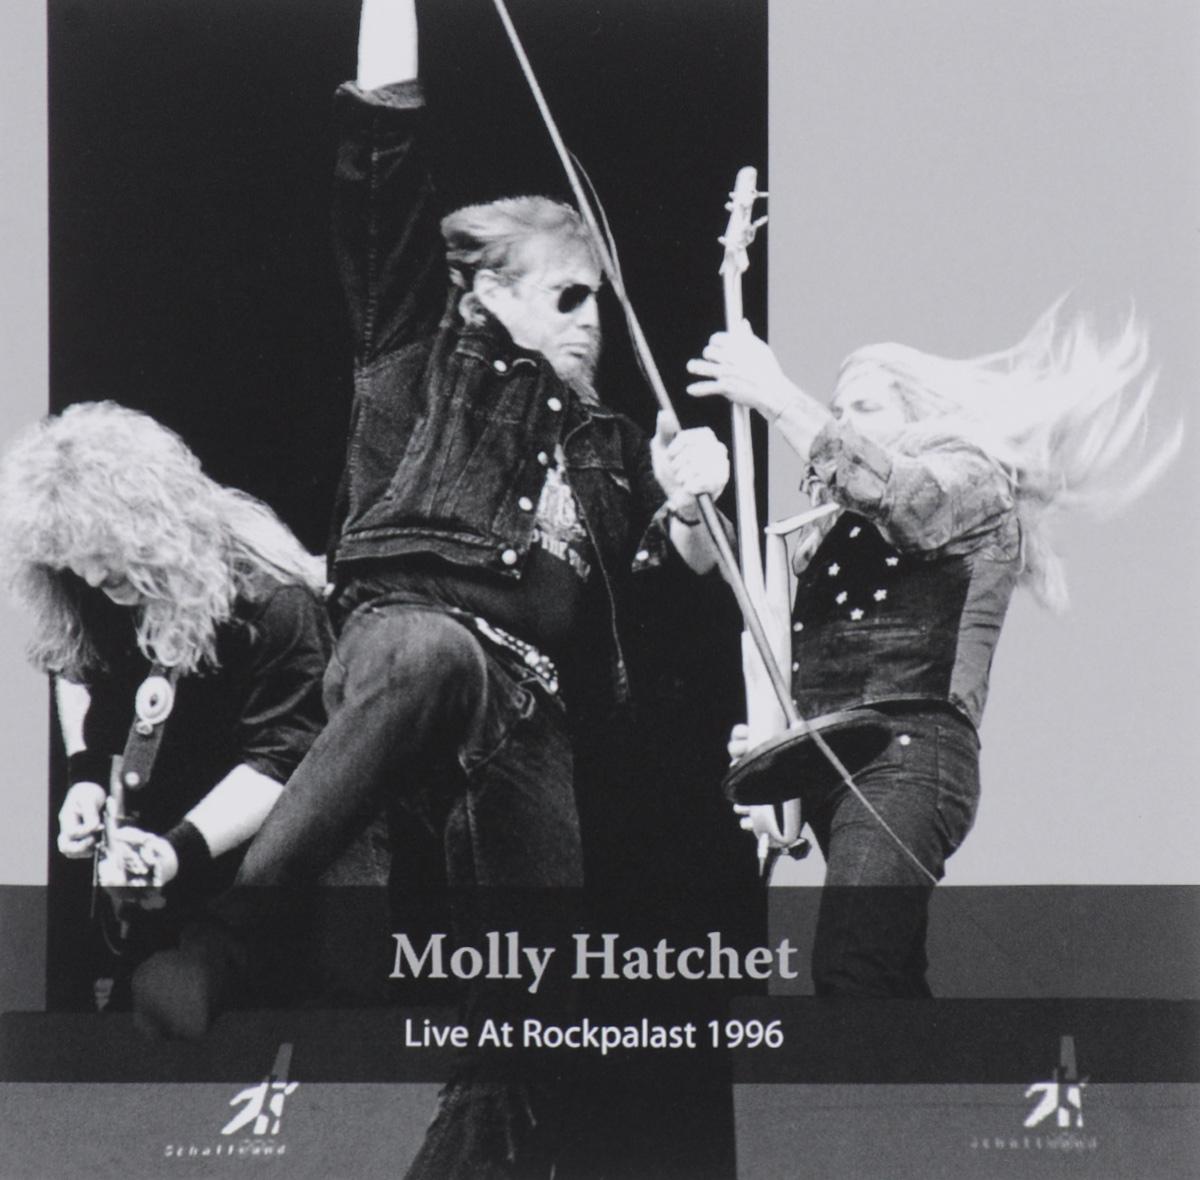 Молли Хатчет Molly Hatchet. Live At Rockpalast 1996 revenge at hatchet creek